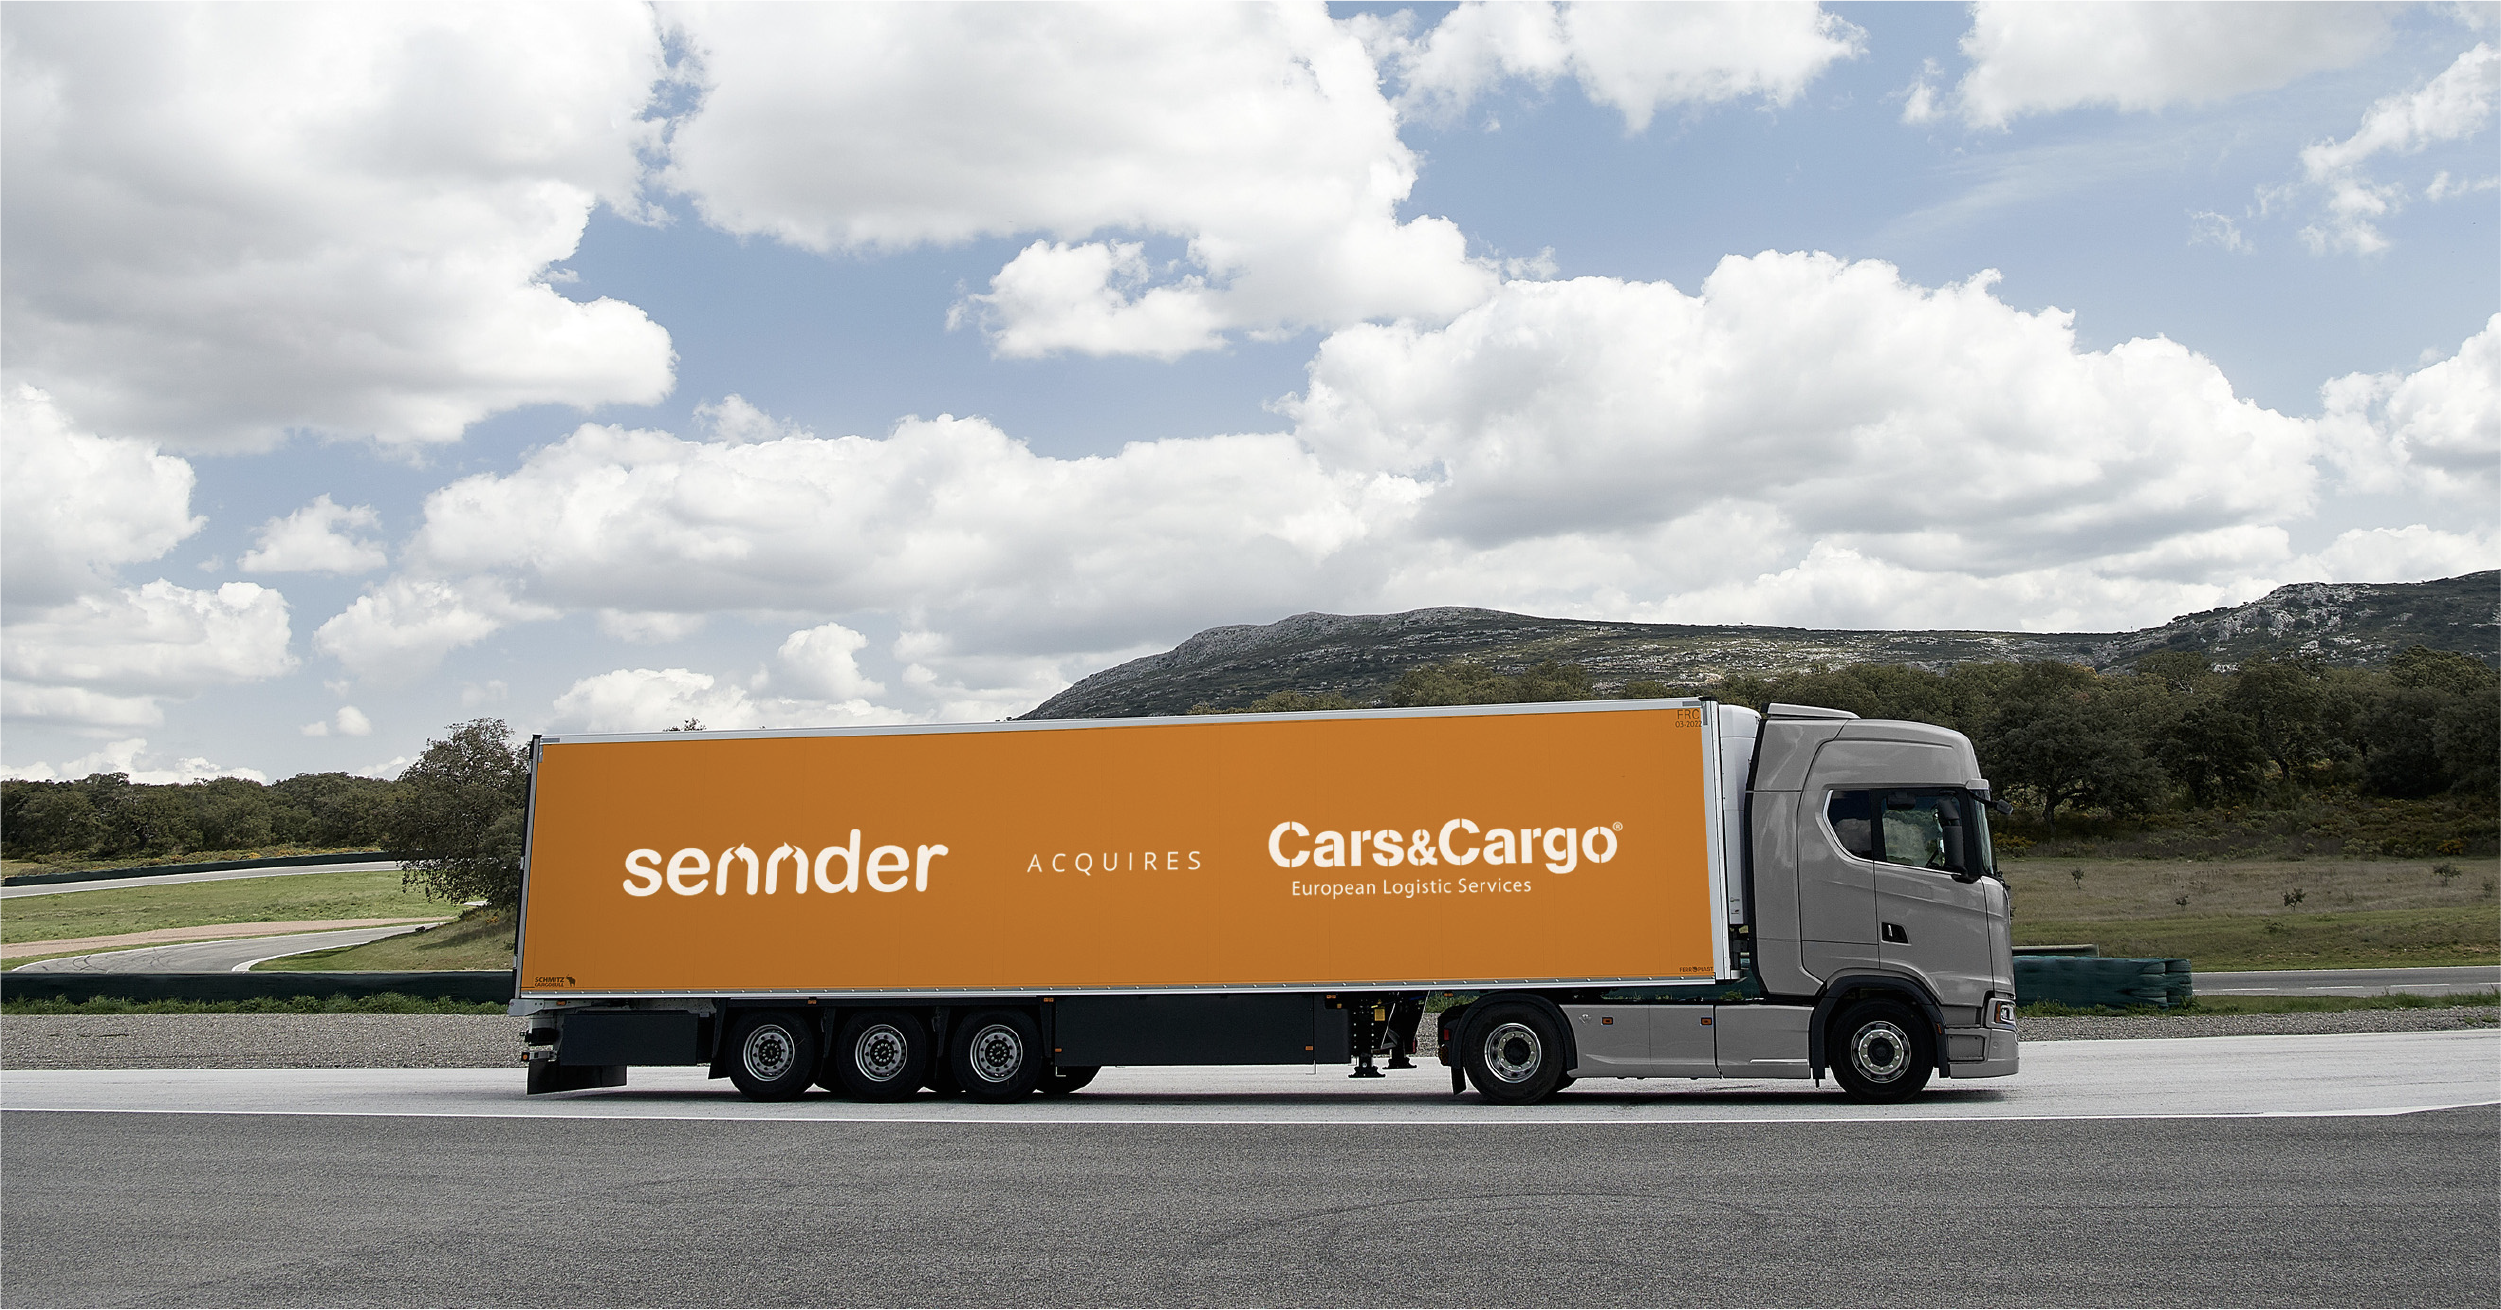 sennder acquires Dutch-based transportation firm Cars&Cargo